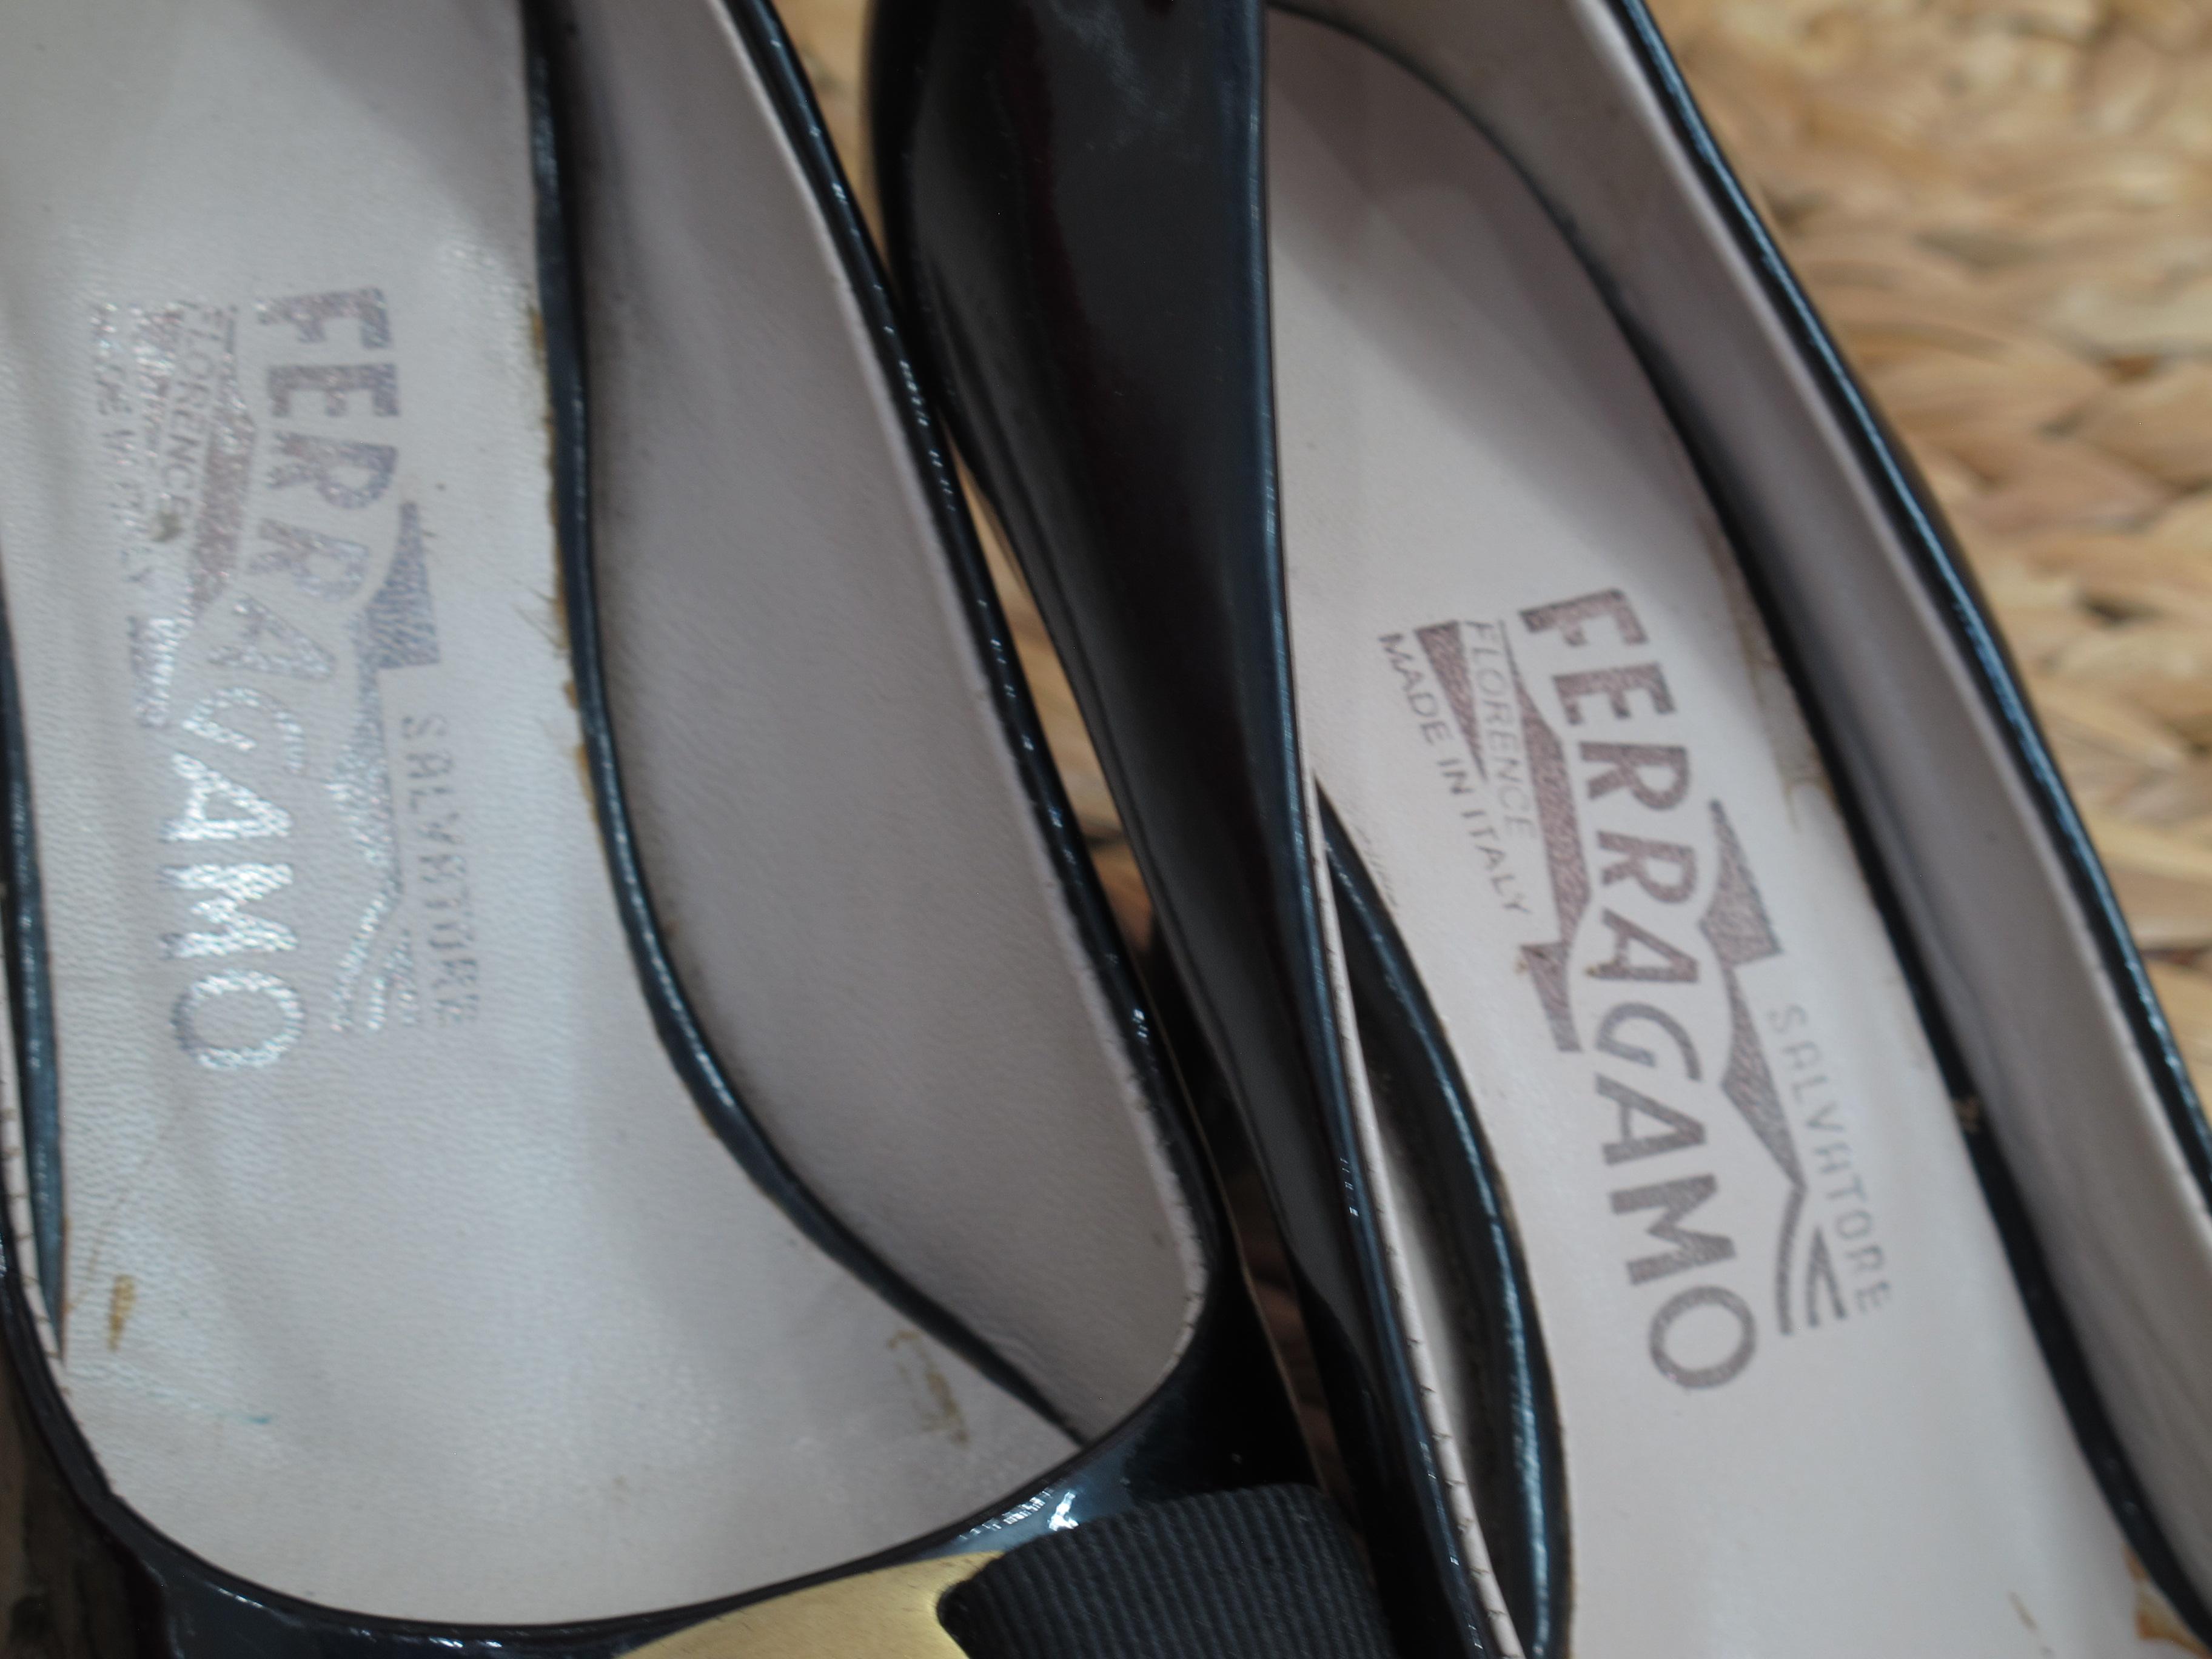 11 Giày Salvatore Ferragamo Nữ Tóp Luxury like new giá rẻ Chuẩn Authentic